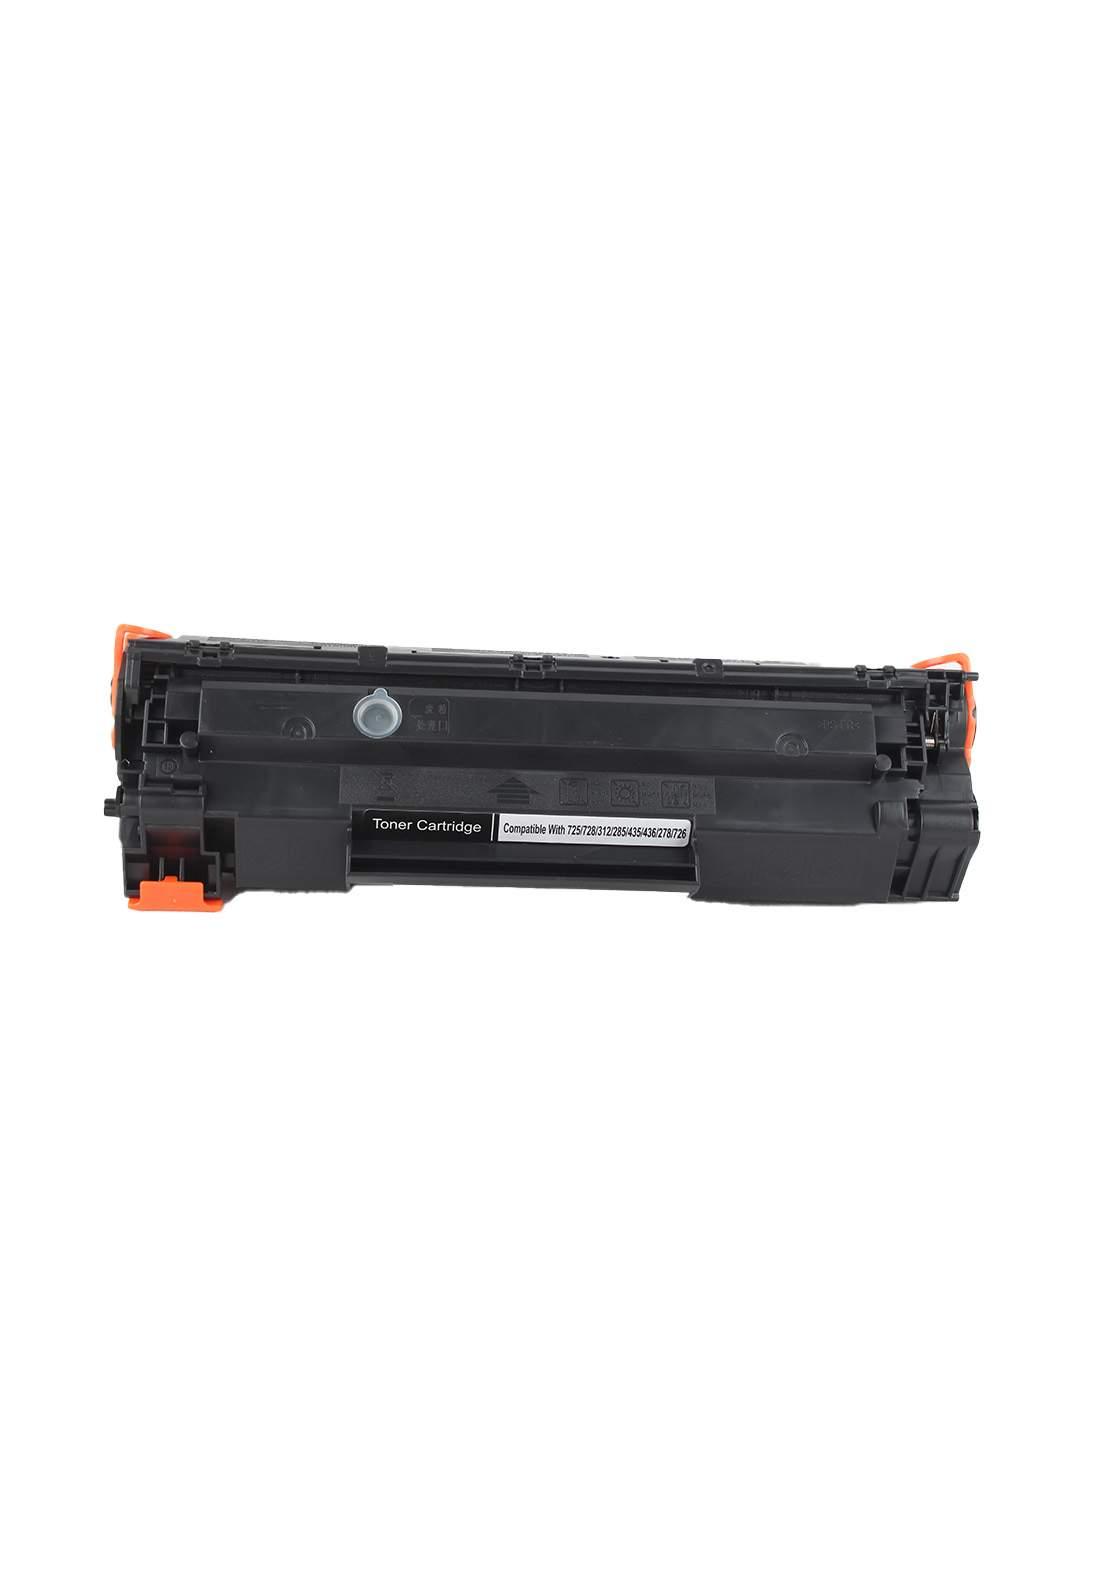 Super Power Plus 725/728/ 312/ 285 /435/436/278 726 Laser Printer Toner Cartridge خرطوشة حبر